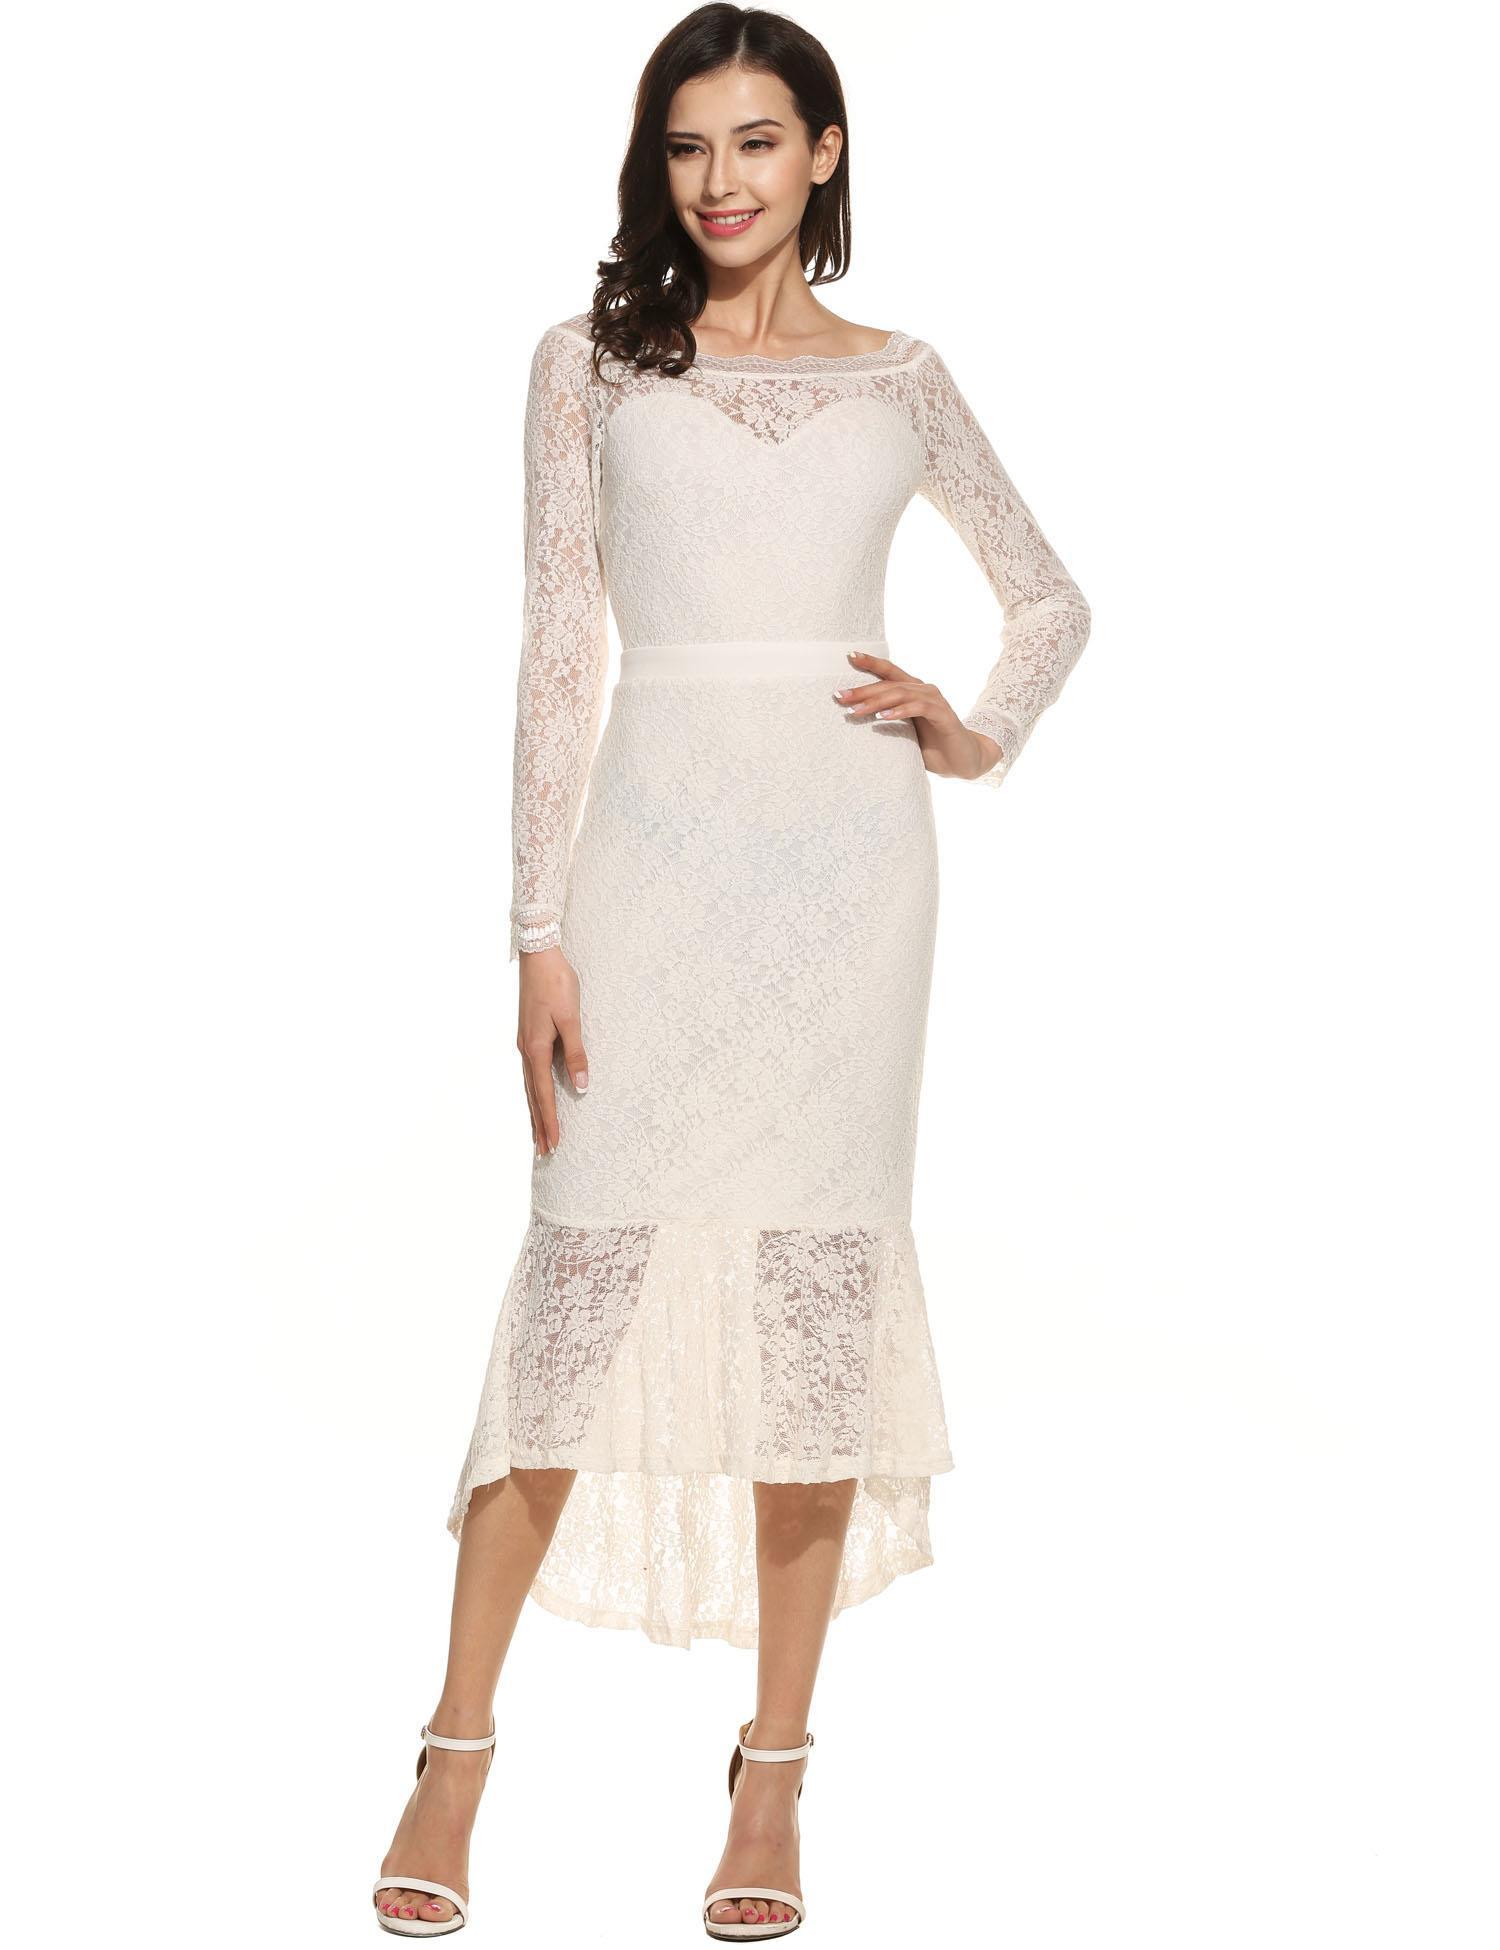 Unique New Women Lady Casual Long Sleeve Lace Dress Patchwork Off Shoulder  Lace Fishtail Dress 38555fddb039